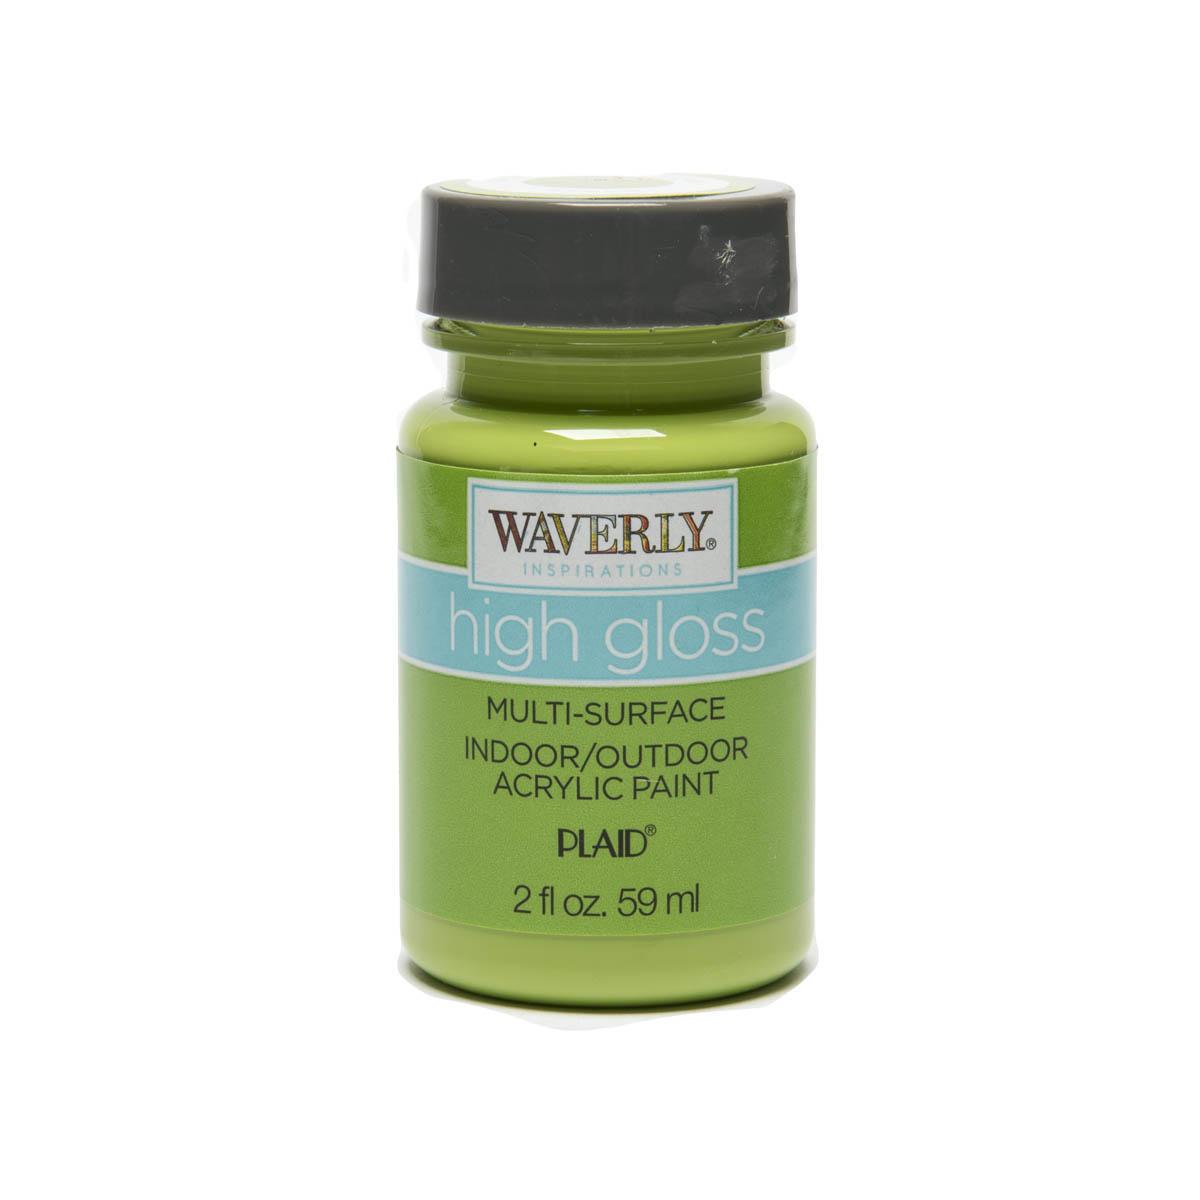 Waverly ® Inspirations High Gloss Multi-Surface Acrylic Paint - Grass, 2 oz. - 60932E